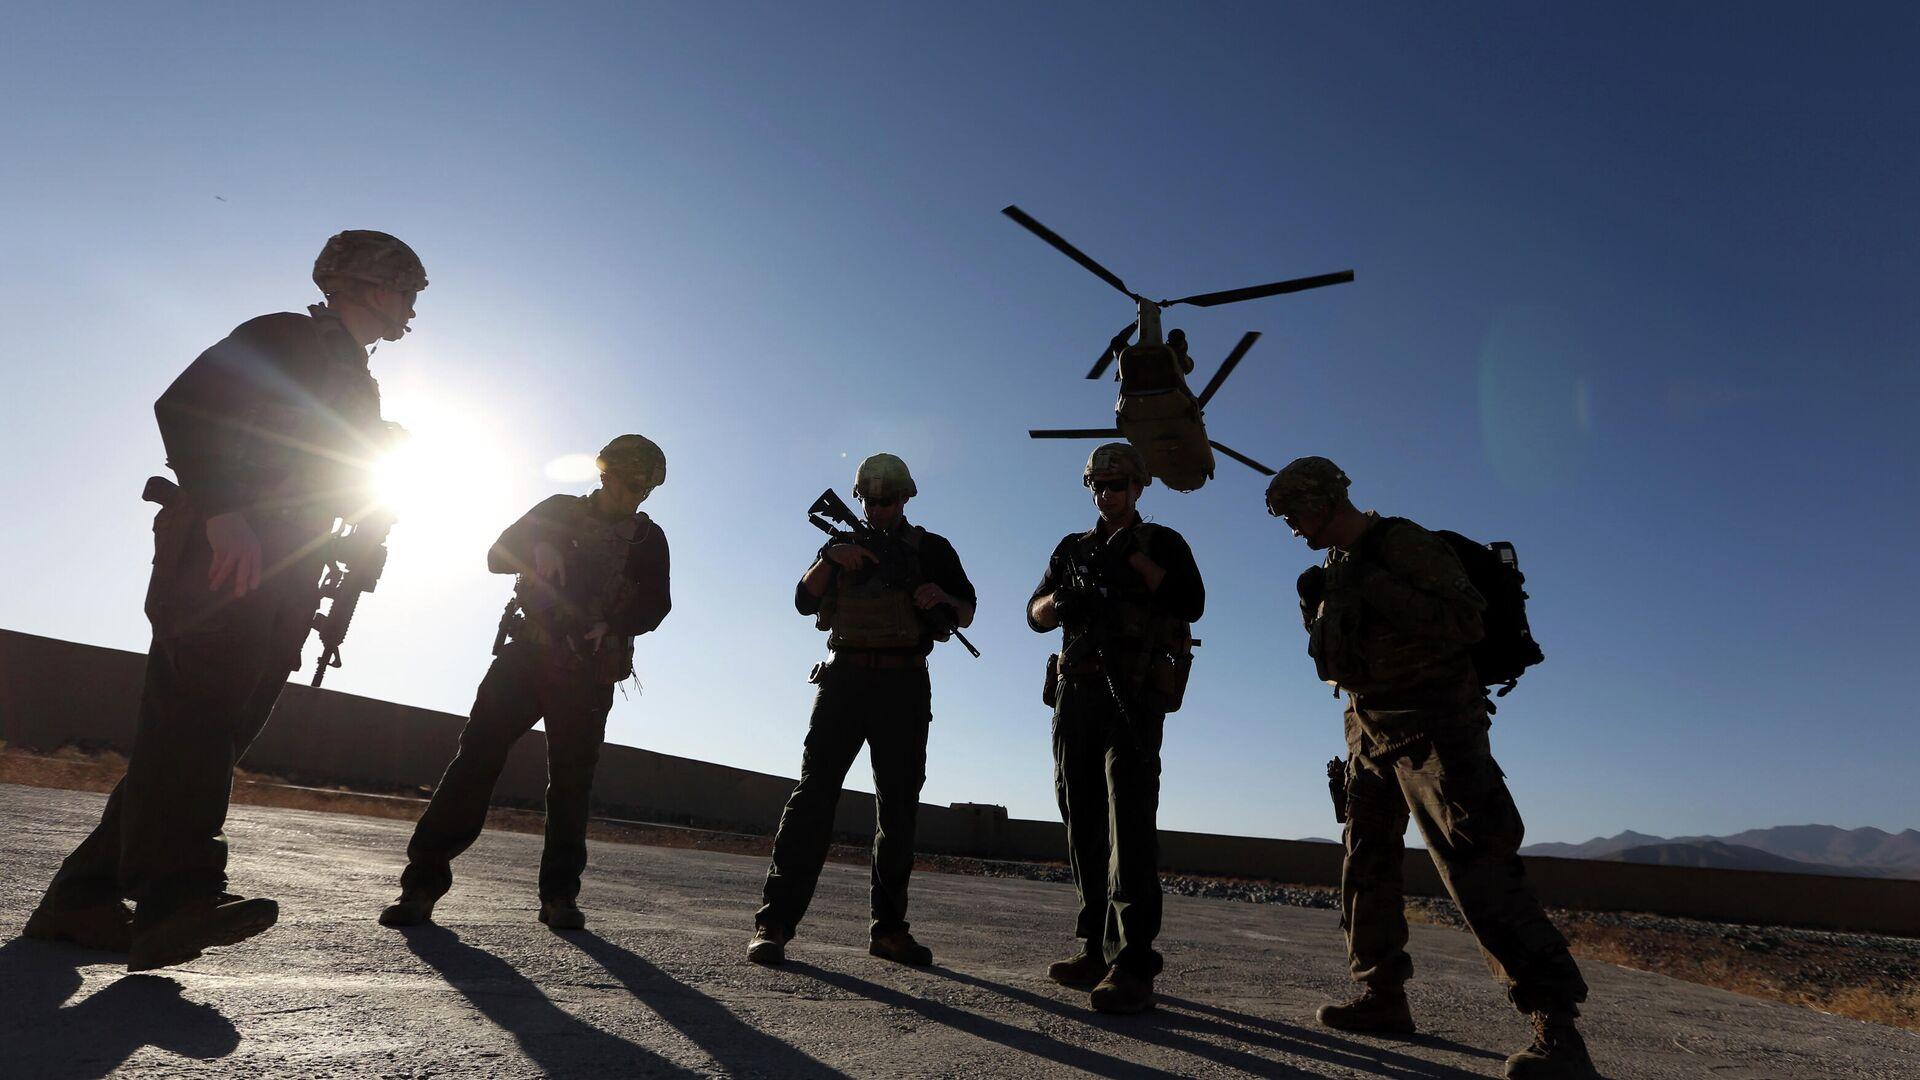 Американские солдаты в провинции Логар, Афганистан. - РИА Новости, 1920, 15.04.2021